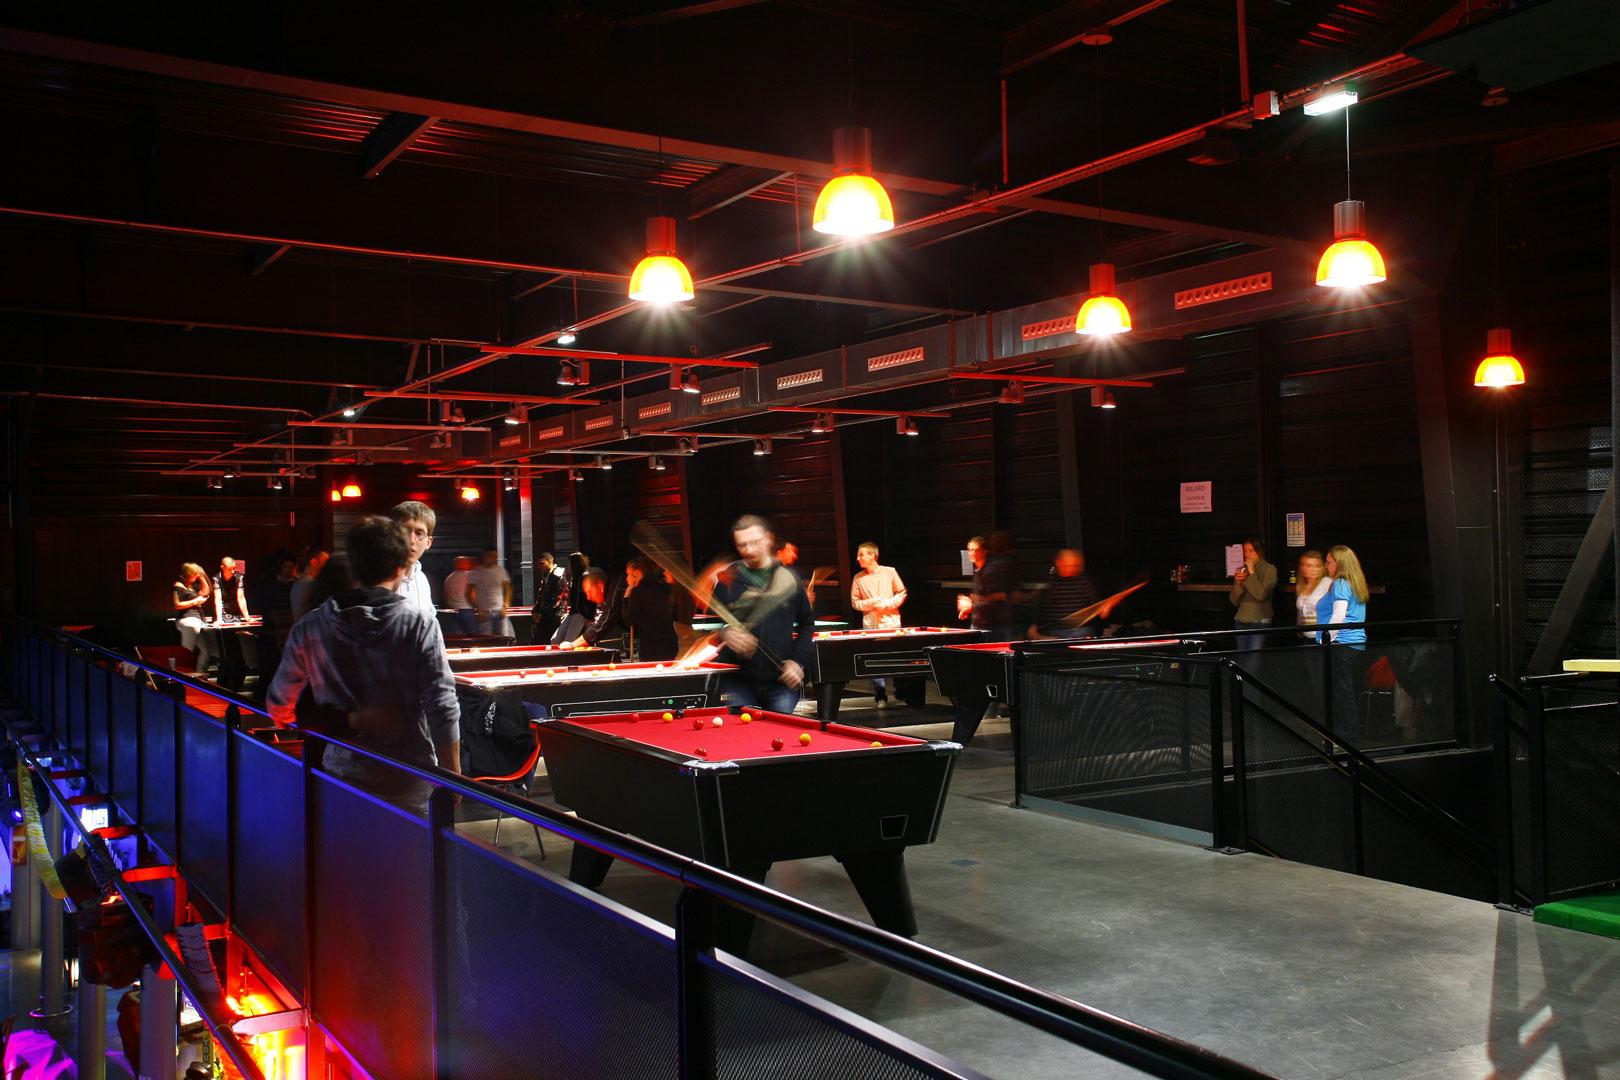 Billard / Jeux / Retransmissions | B.bowl Center à Jeux De Biyare